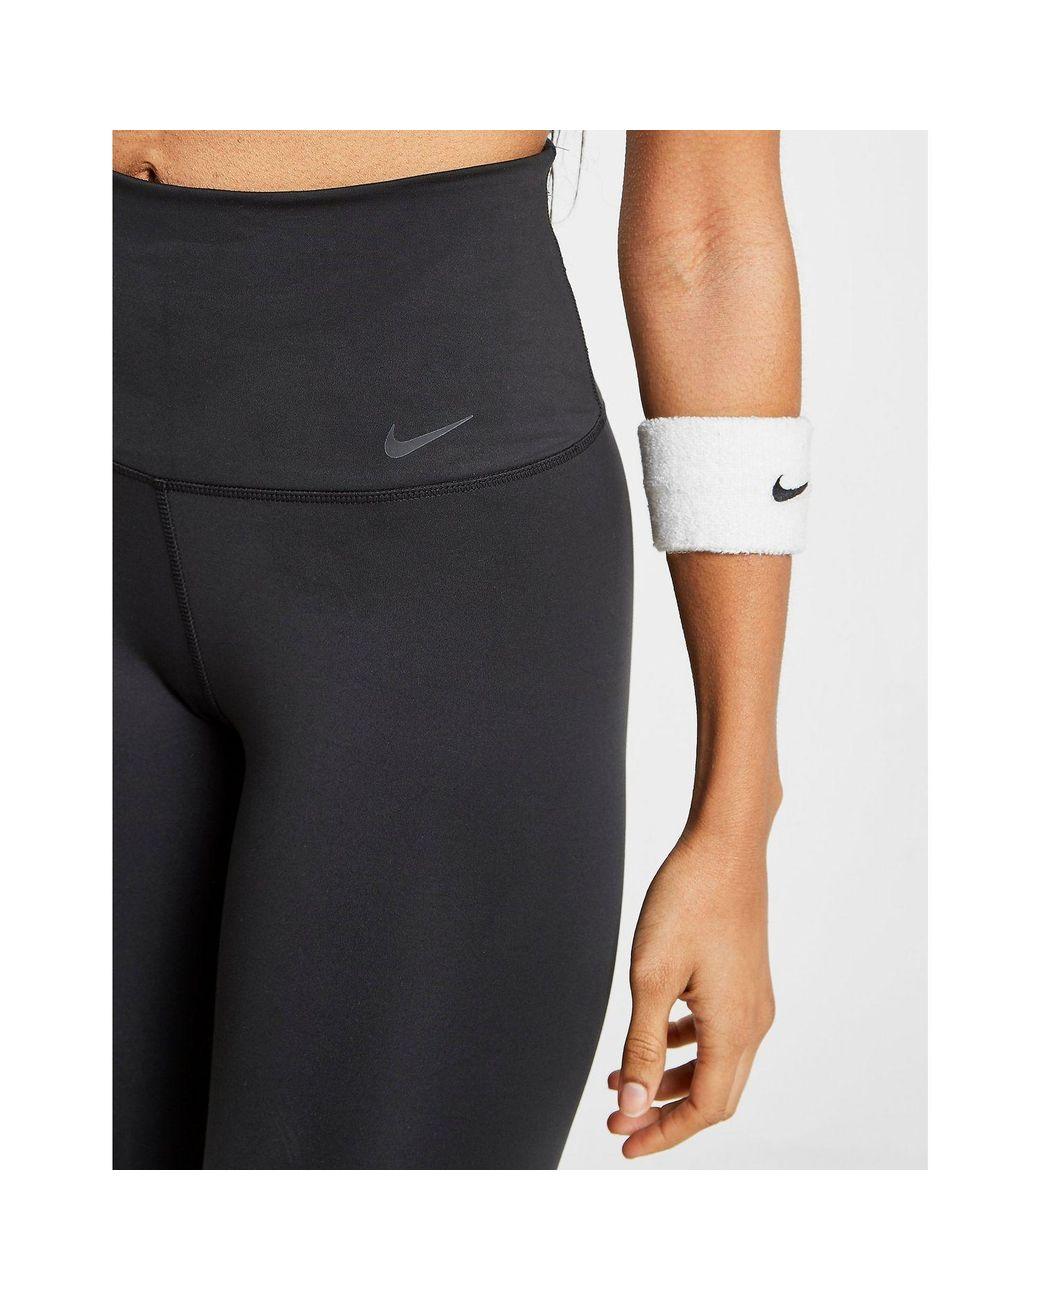 7ee24fd4e493b Nike Training Studio Flare Tights in Black - Save 2% - Lyst